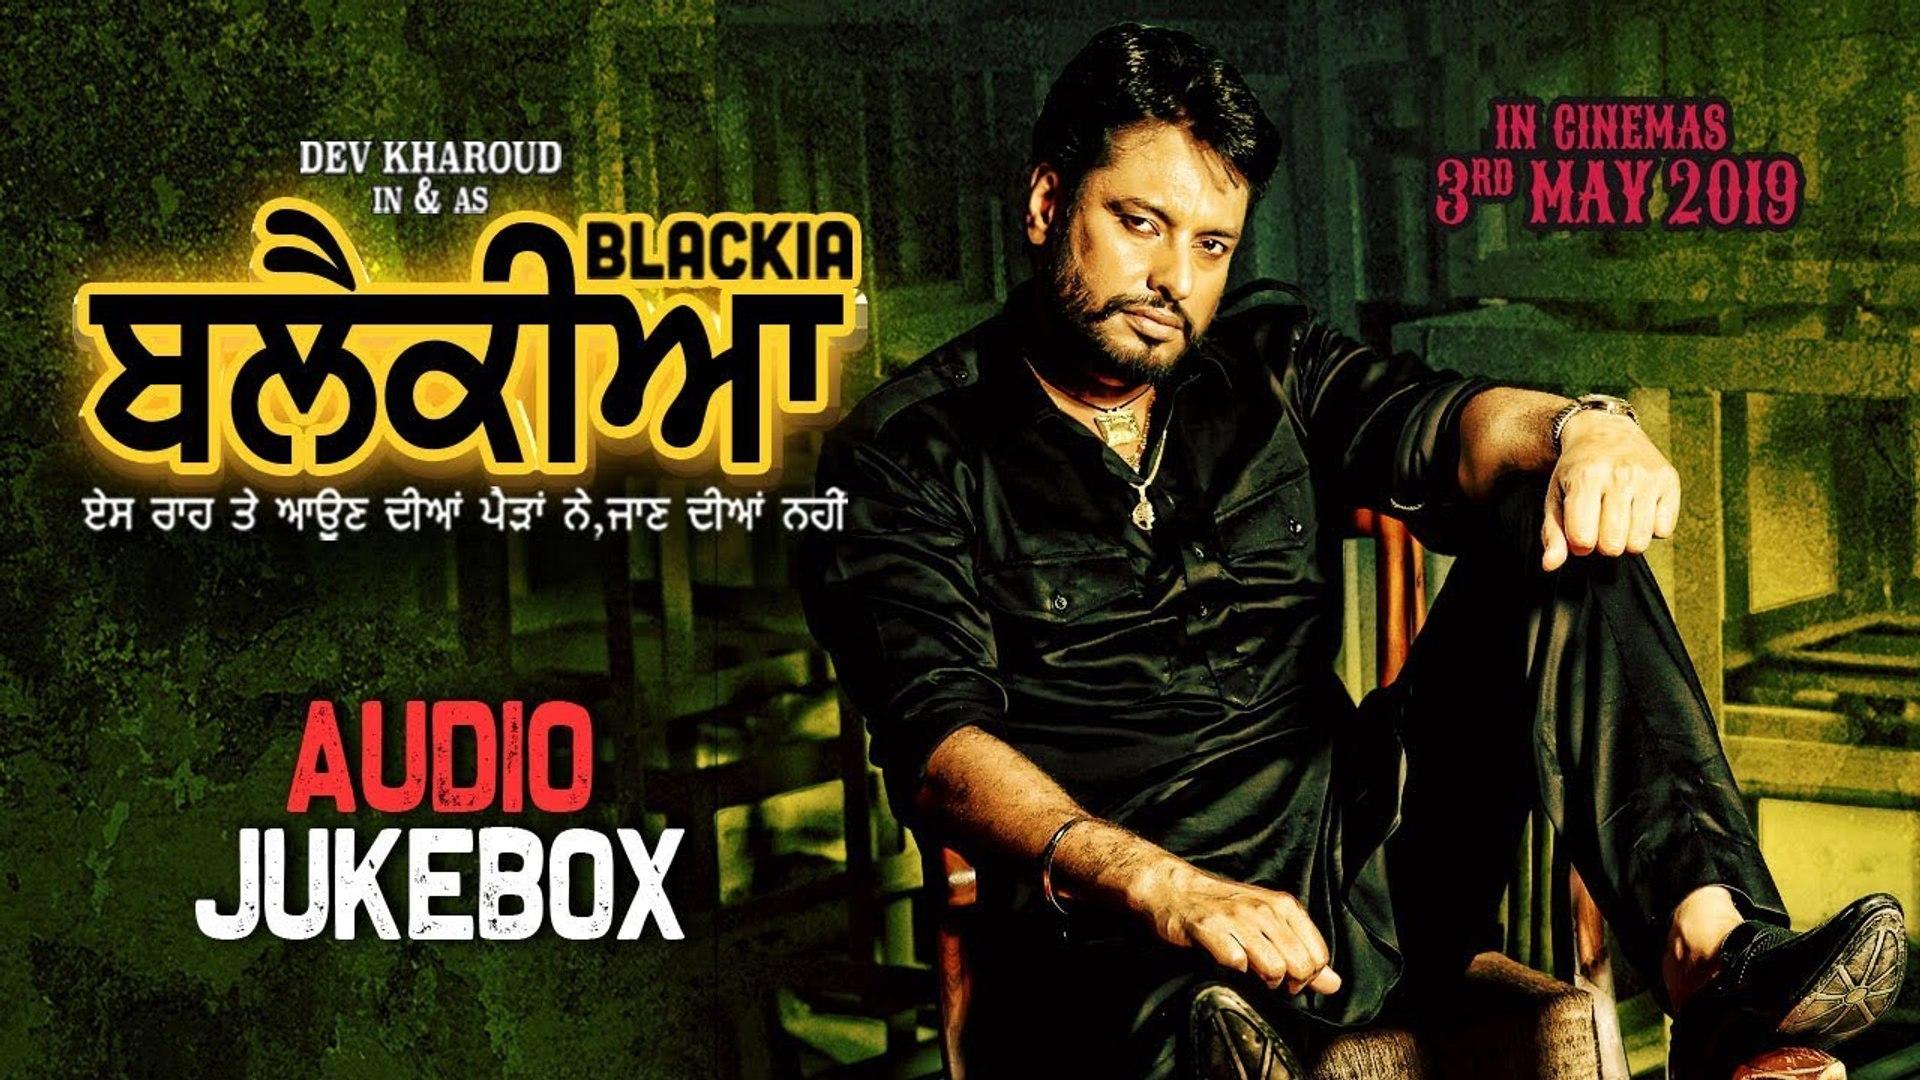 Beaches] Punjabi movie download 2019 blackia